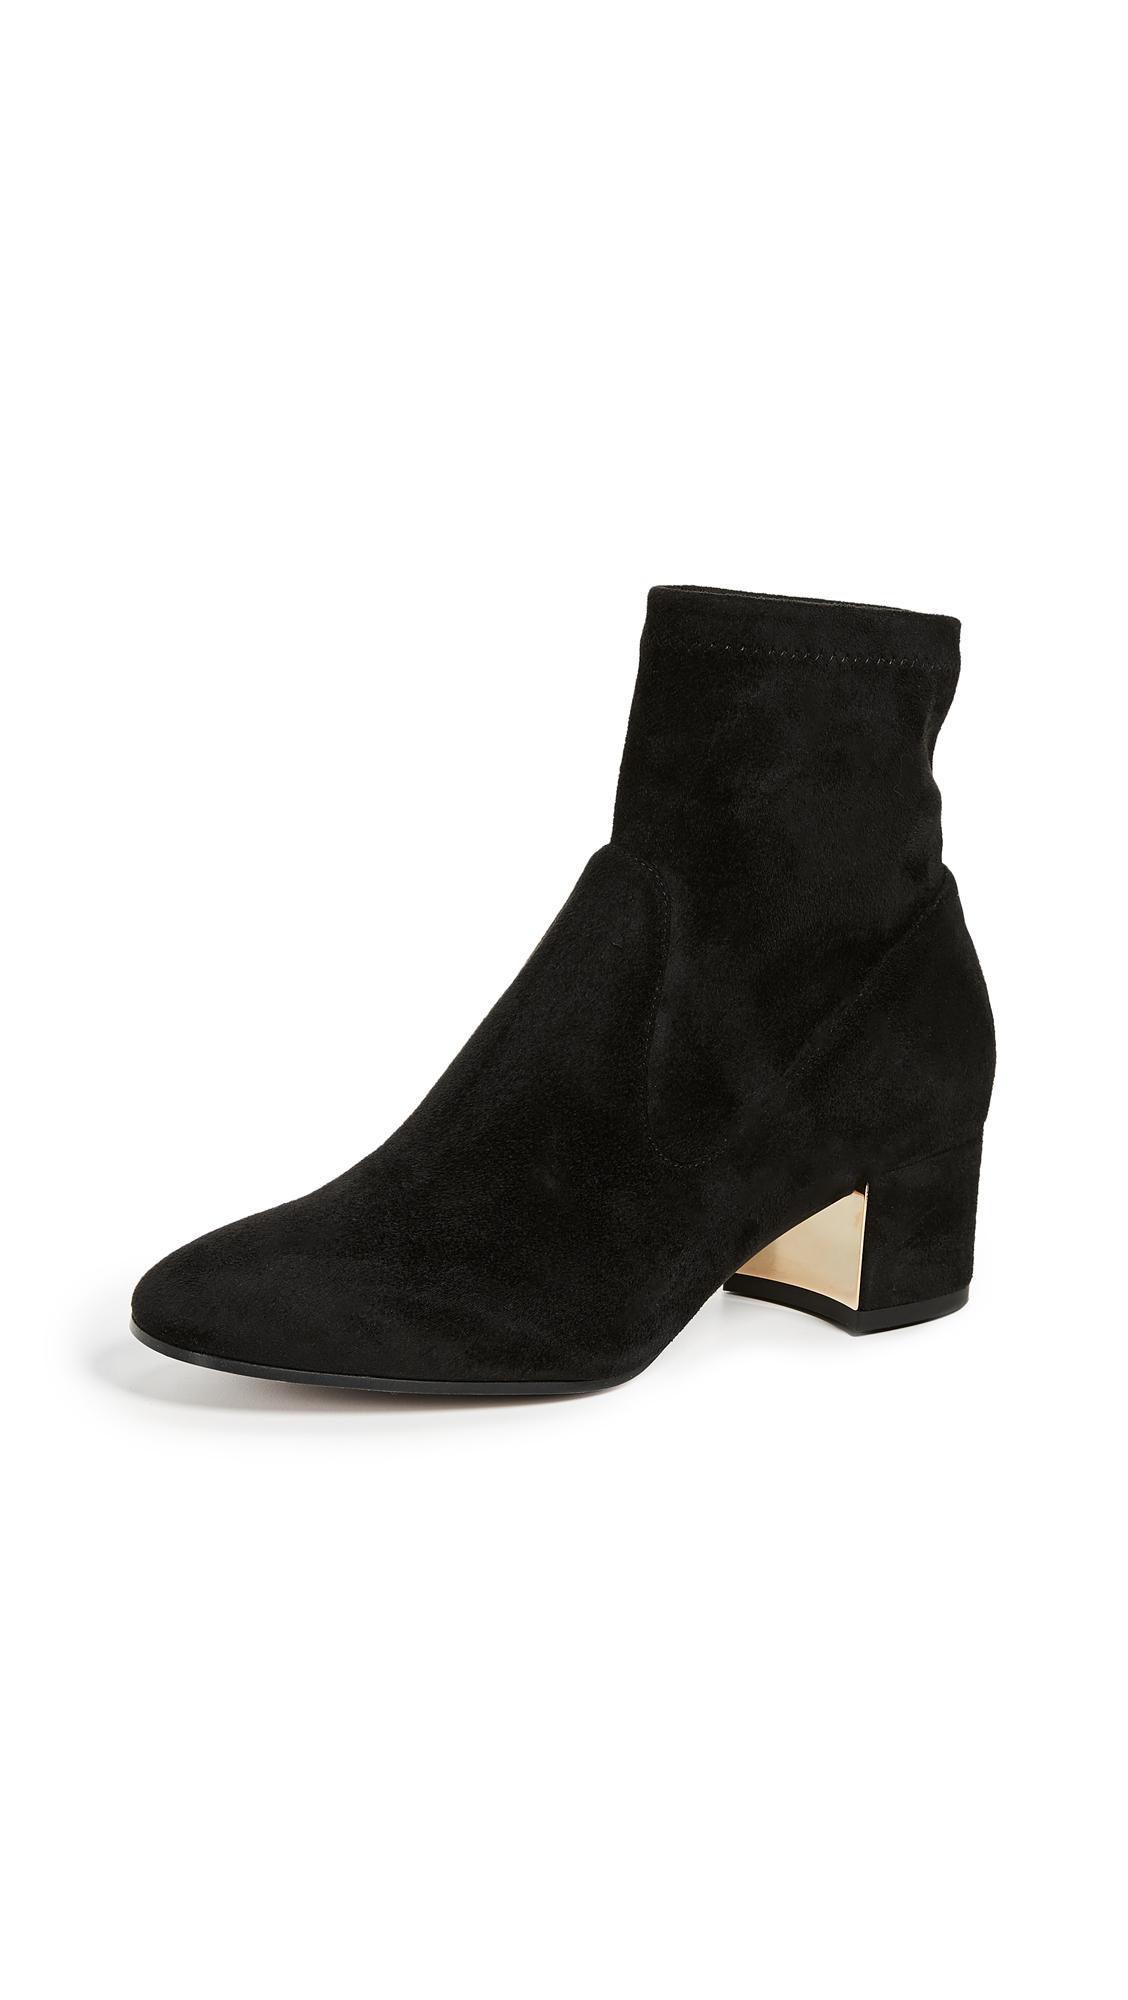 Marion Parke Grace Block Heel Ankle Boots - Black